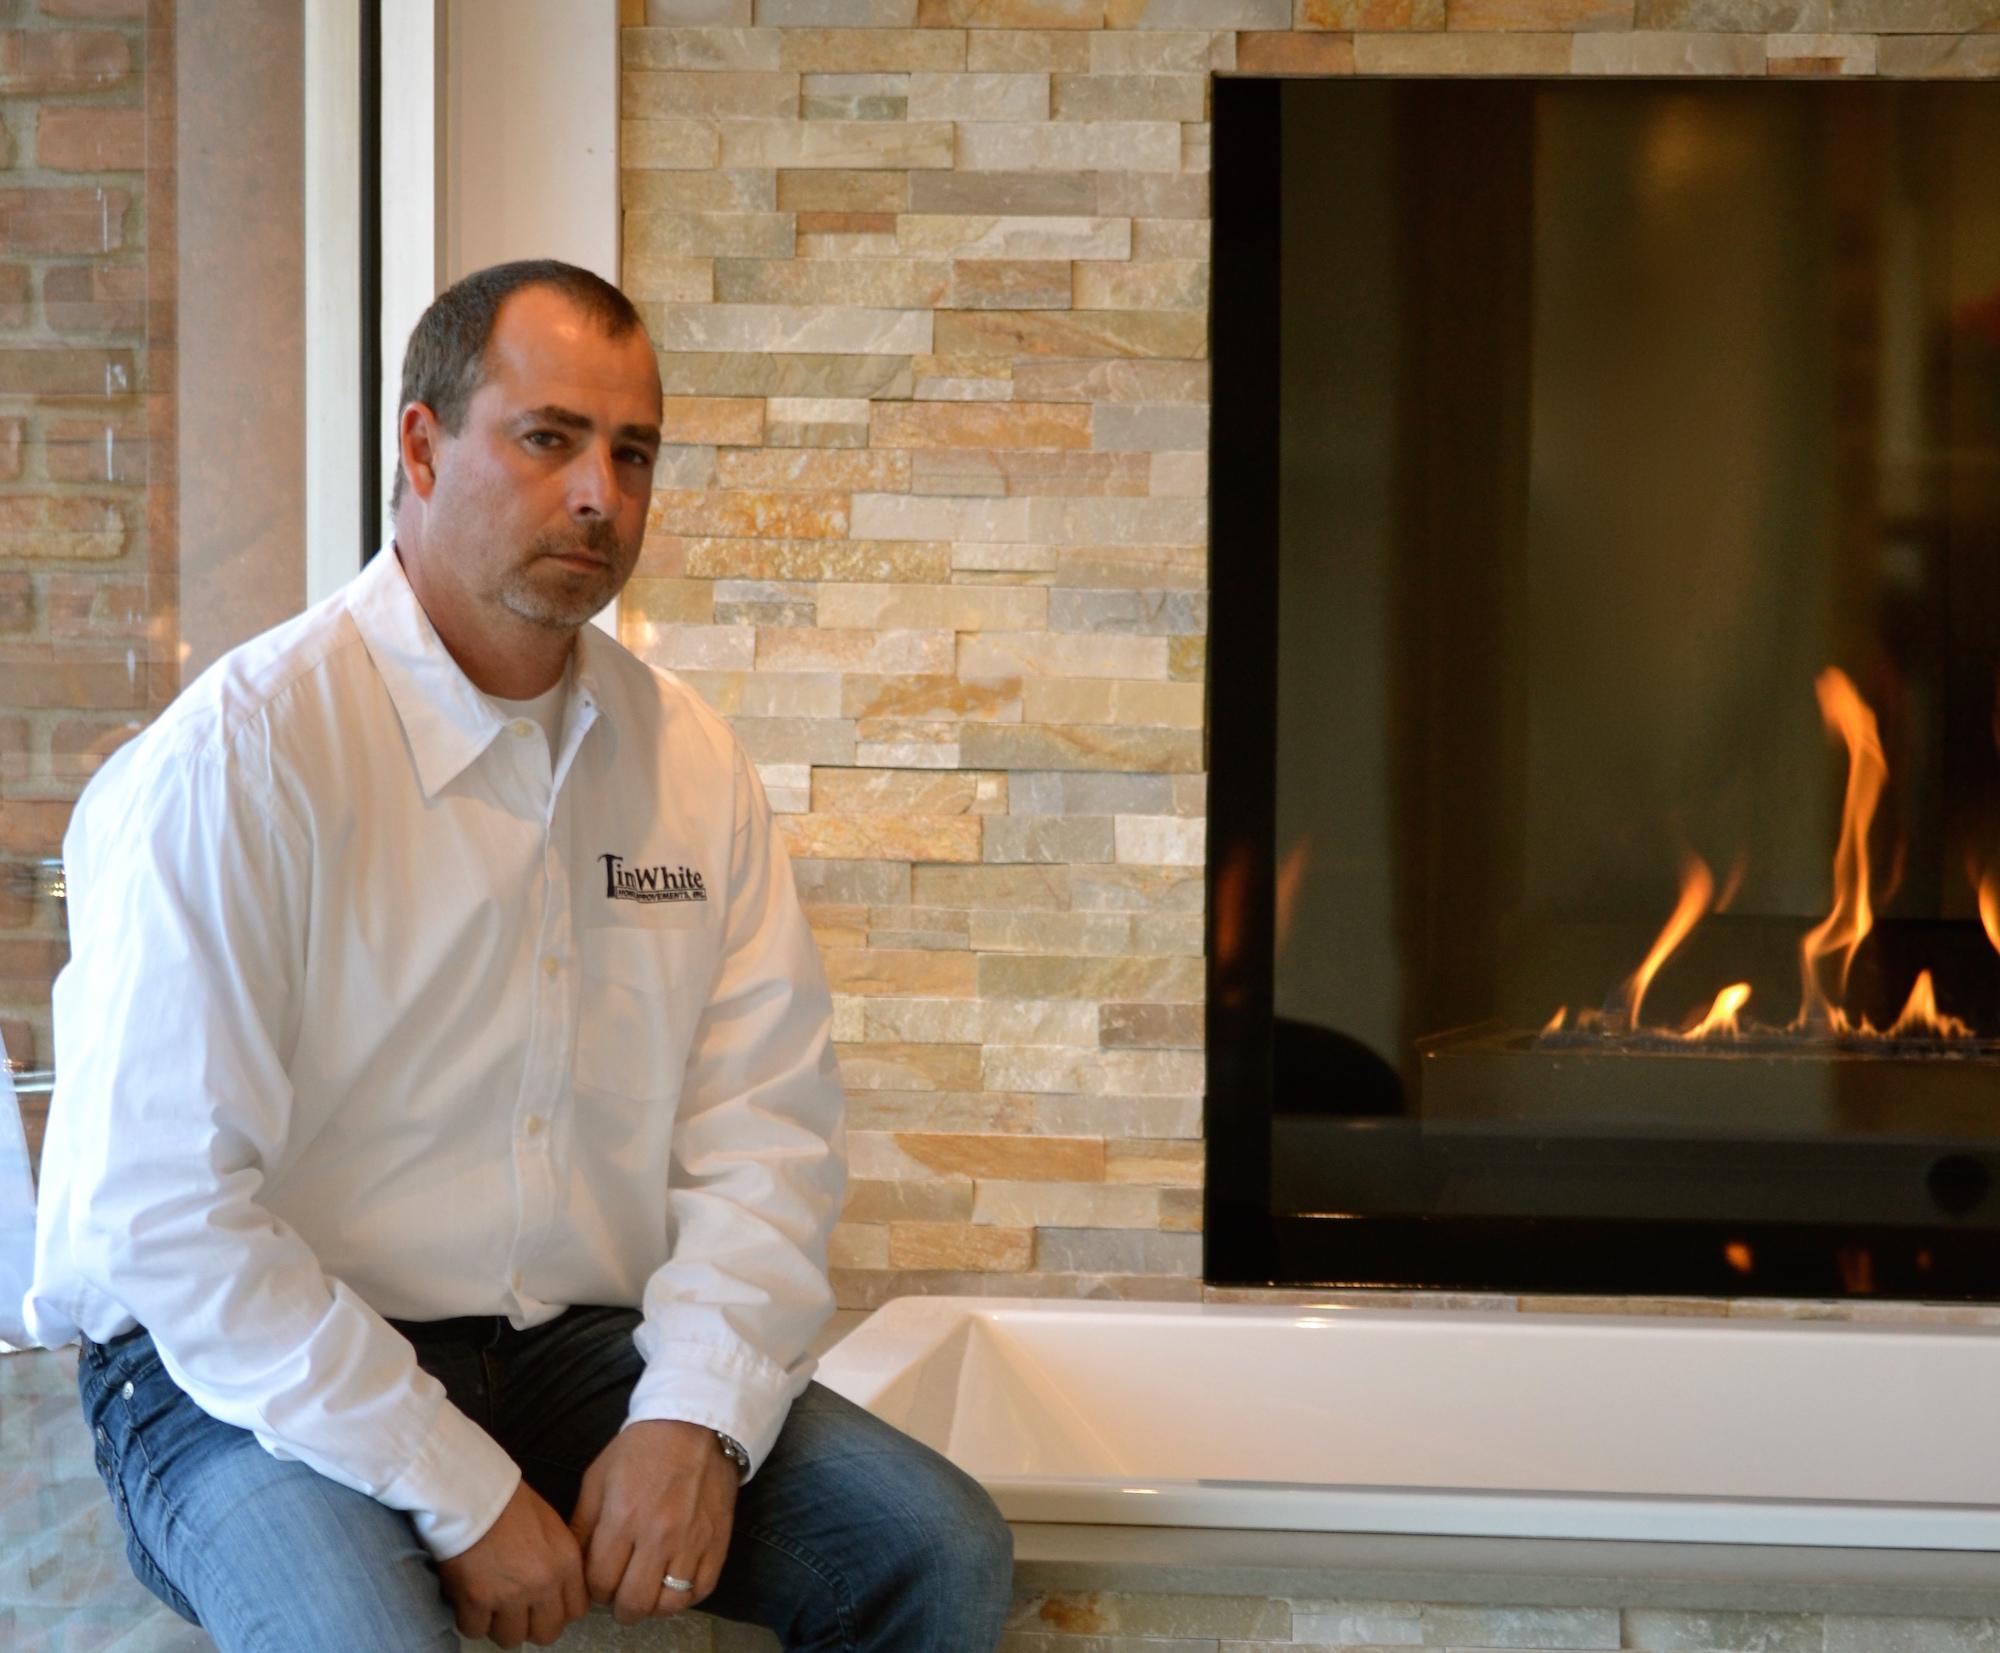 Remodeling Big 50 2015 Tim White Home Improvement